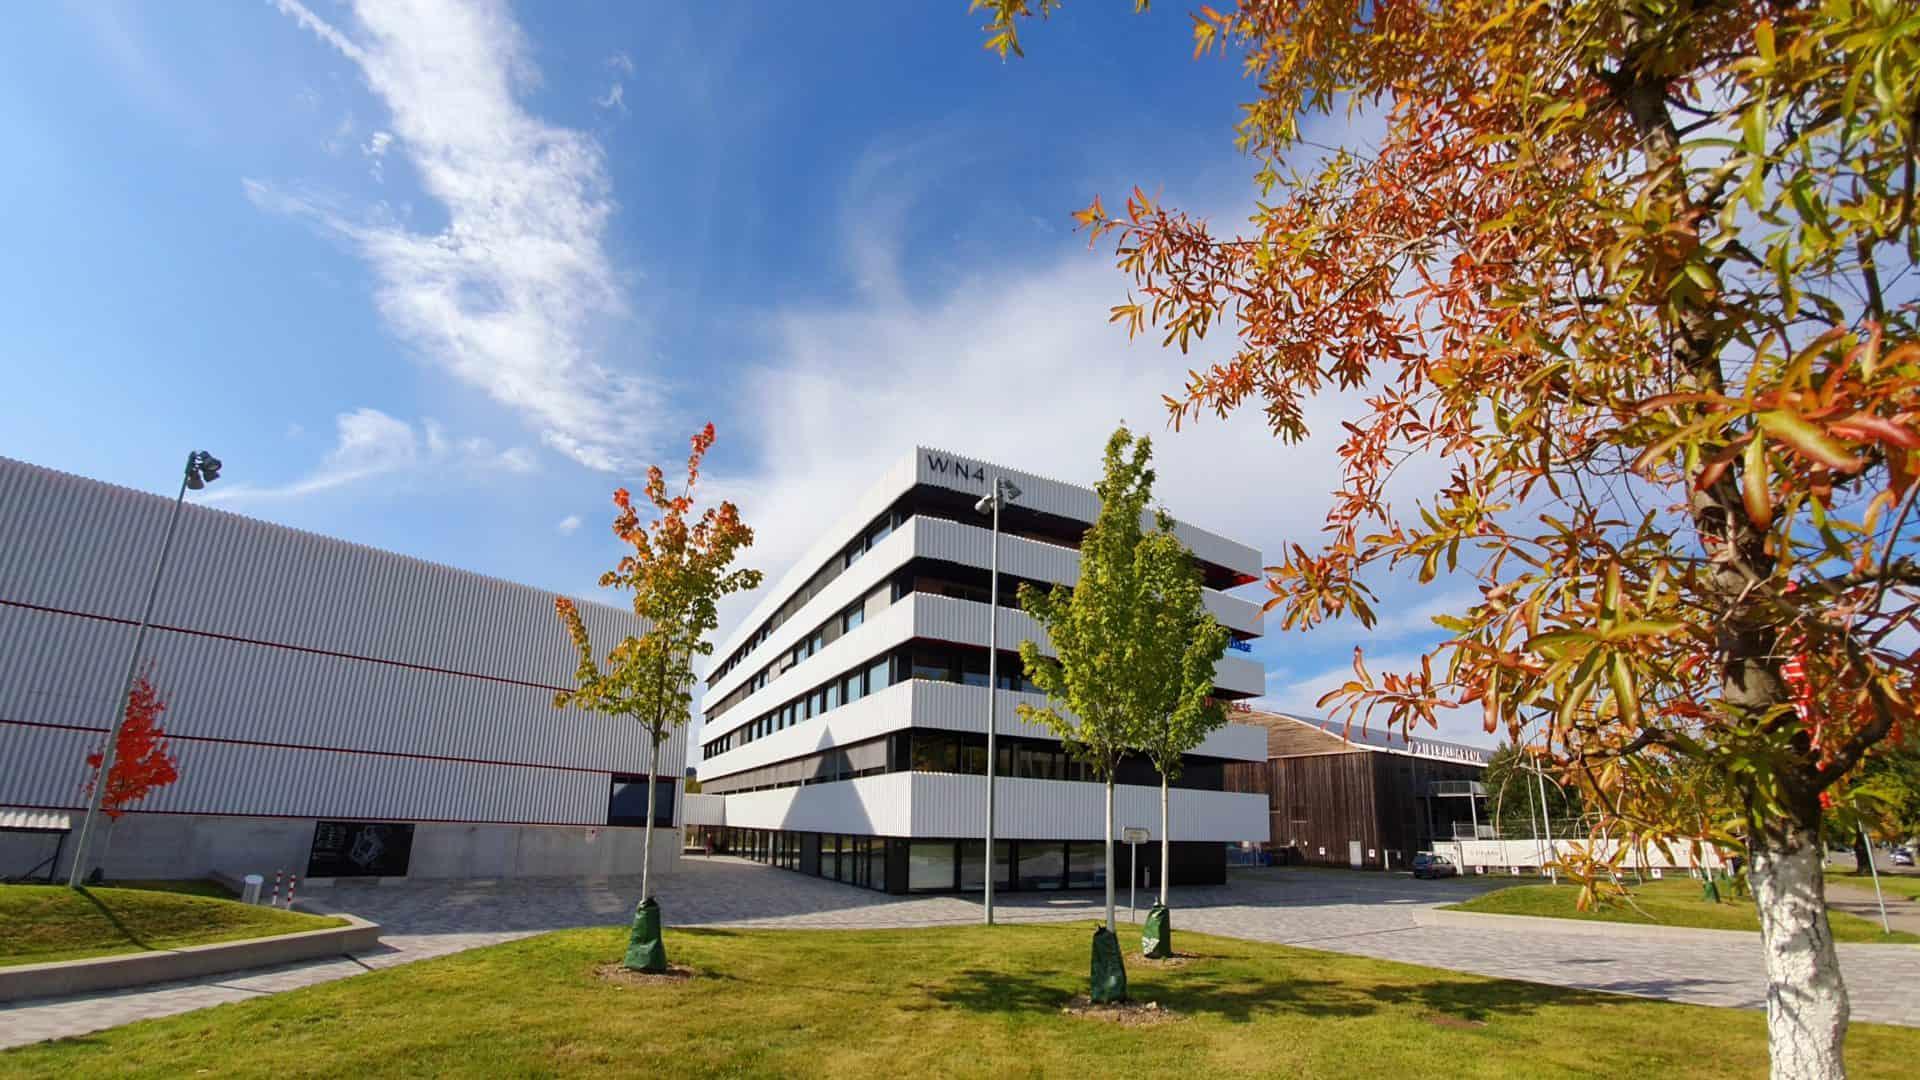 Academia Bilingual School Winterthur